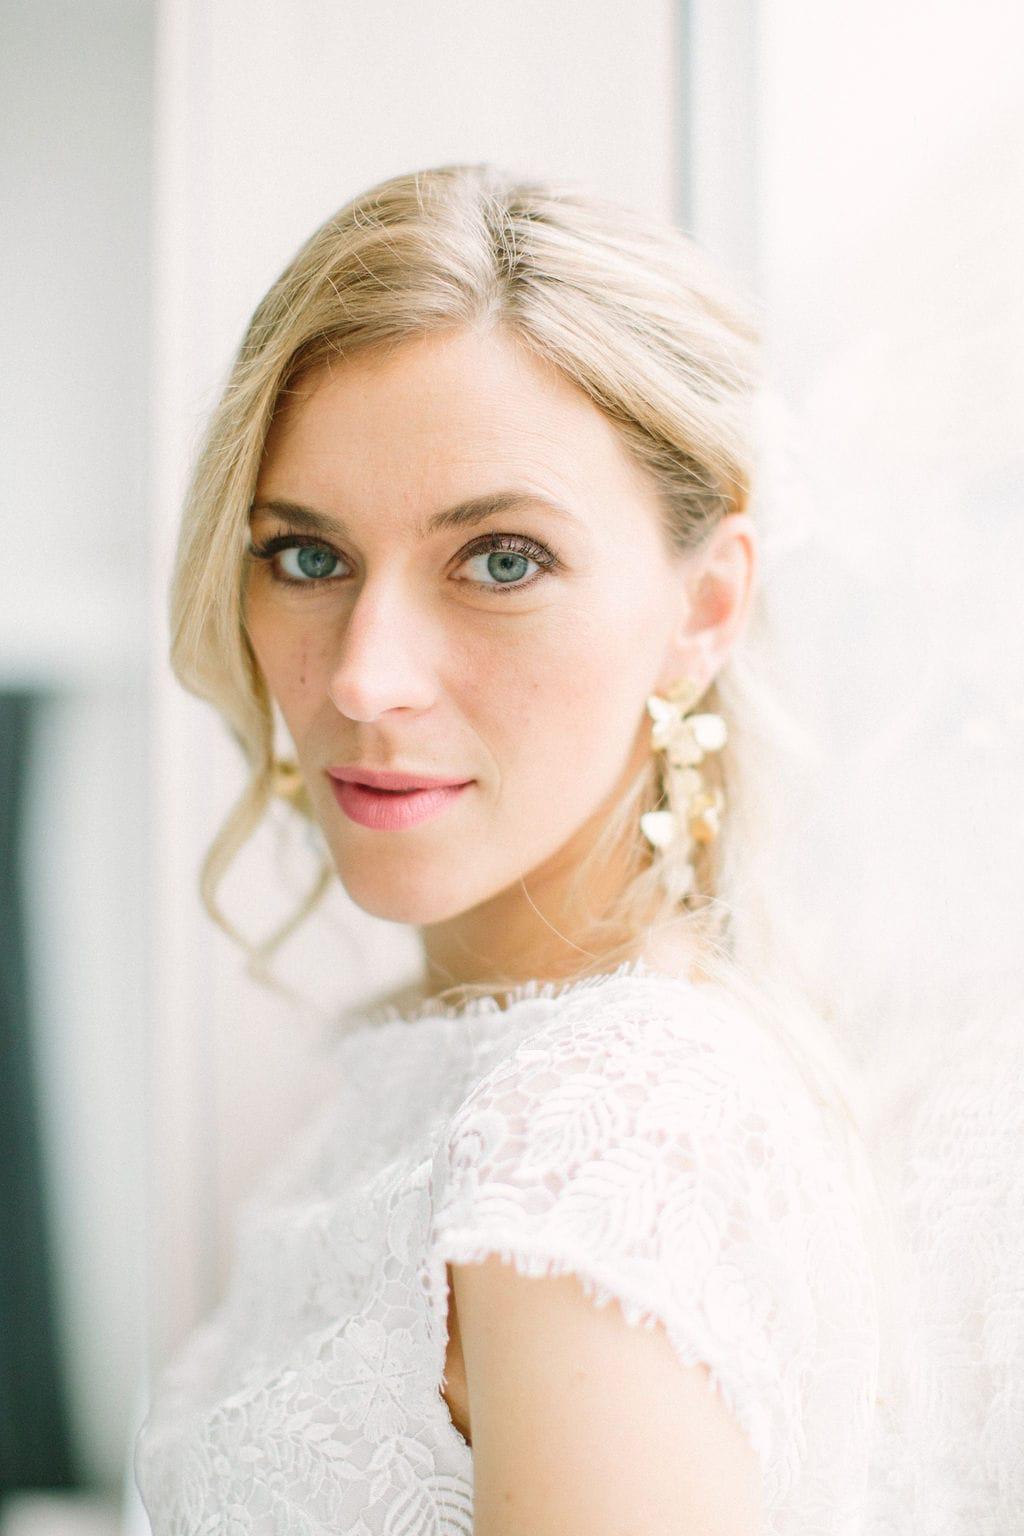 Julie Fabrici - Robes de mariee - Mulhouse - Alsace